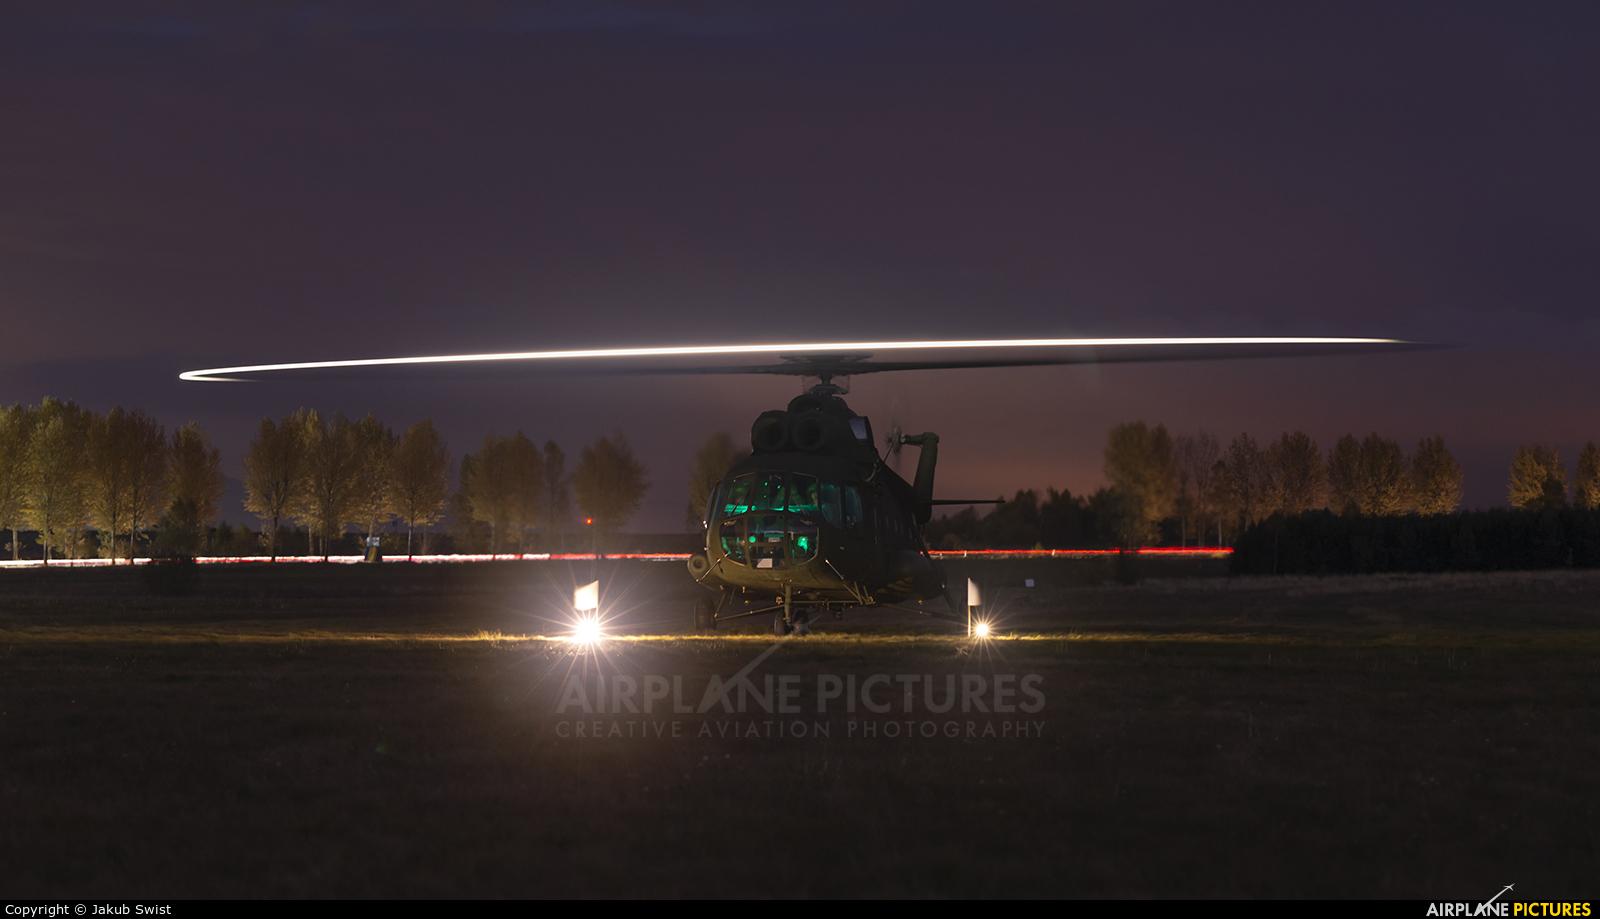 Poland - Air Force 649 aircraft at Nowy Targ Airport